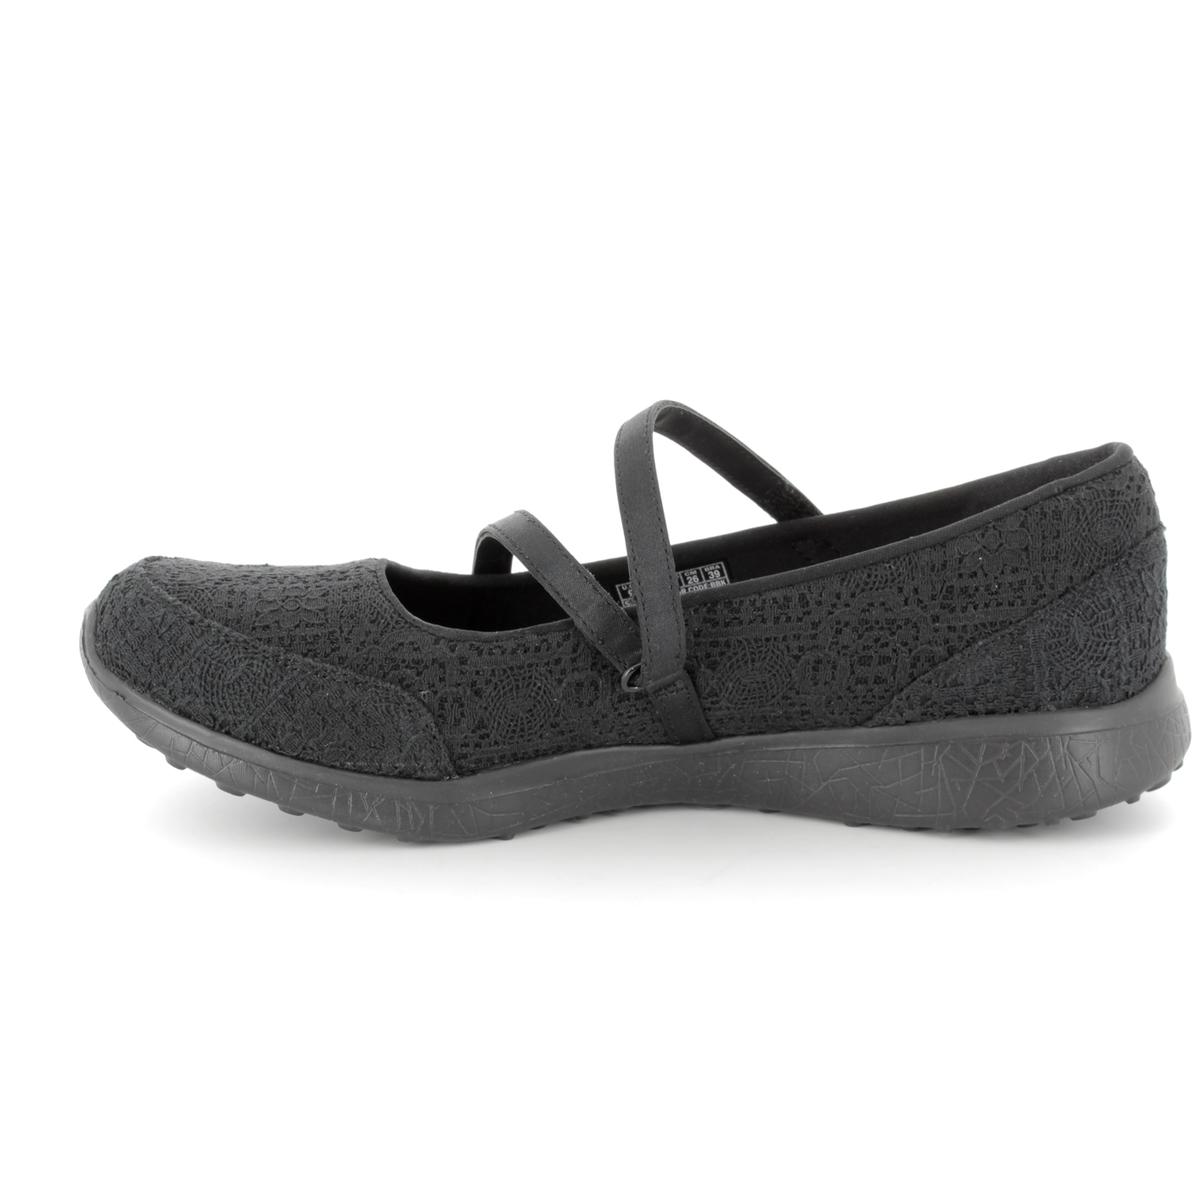 Womens Tan Mary Jane Shoes